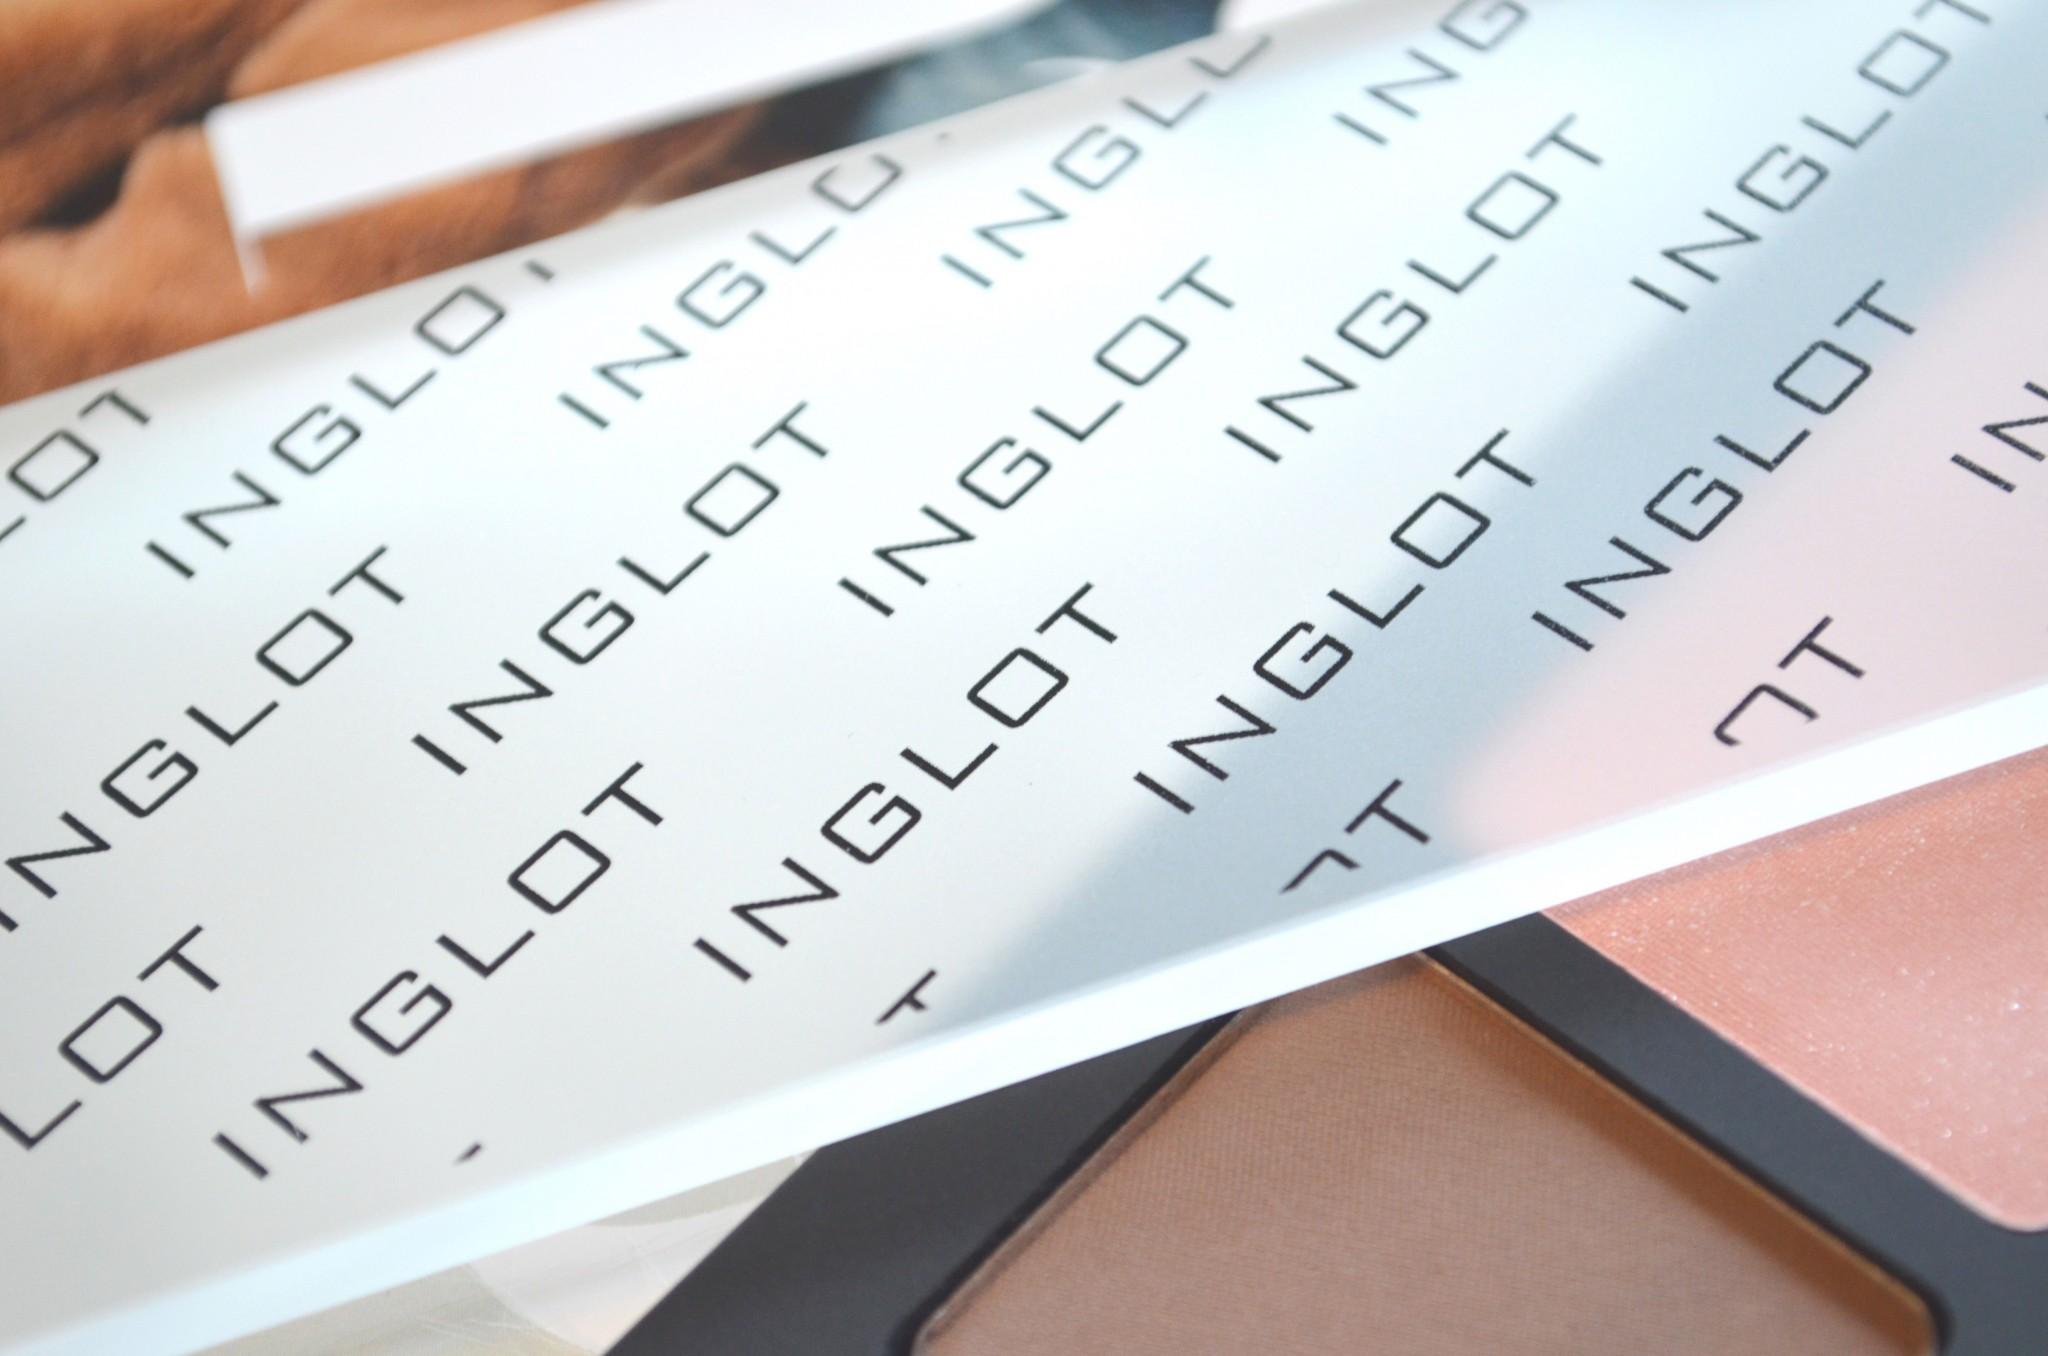 DSC 2049 1 - Nieuwe Inglot Freedom System Eyeshadow + Blush